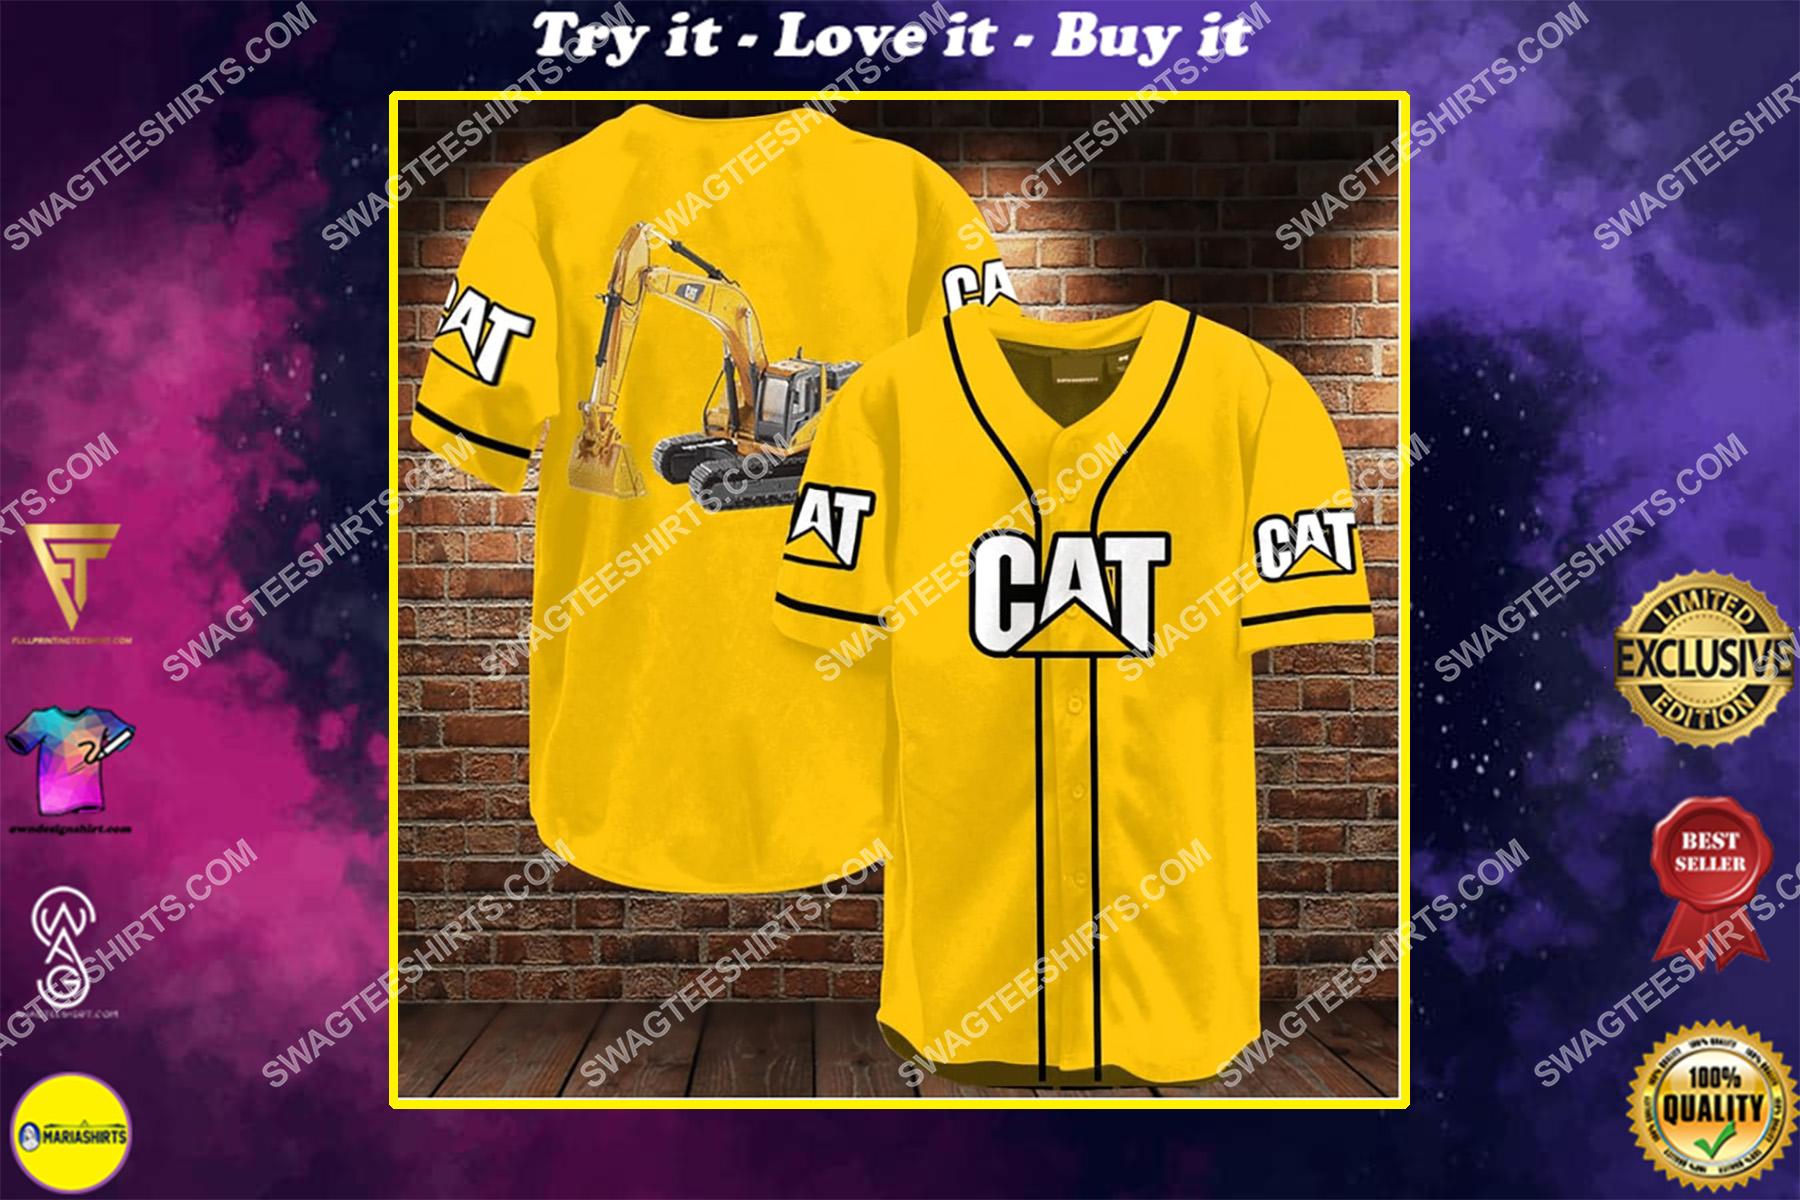 caterpillar company all over printed baseball shirt